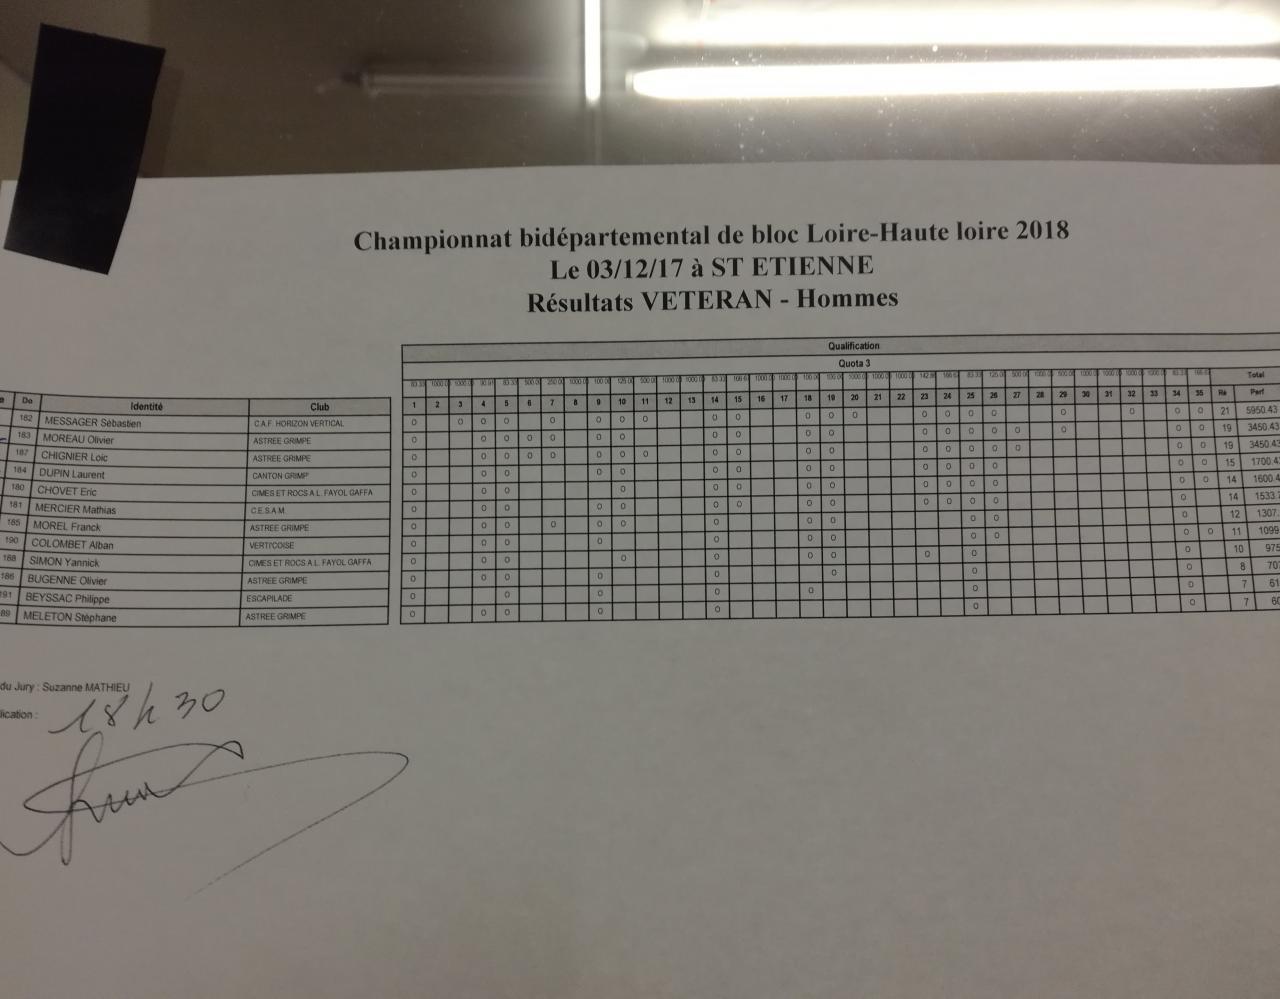 Résultats vétérans hommes